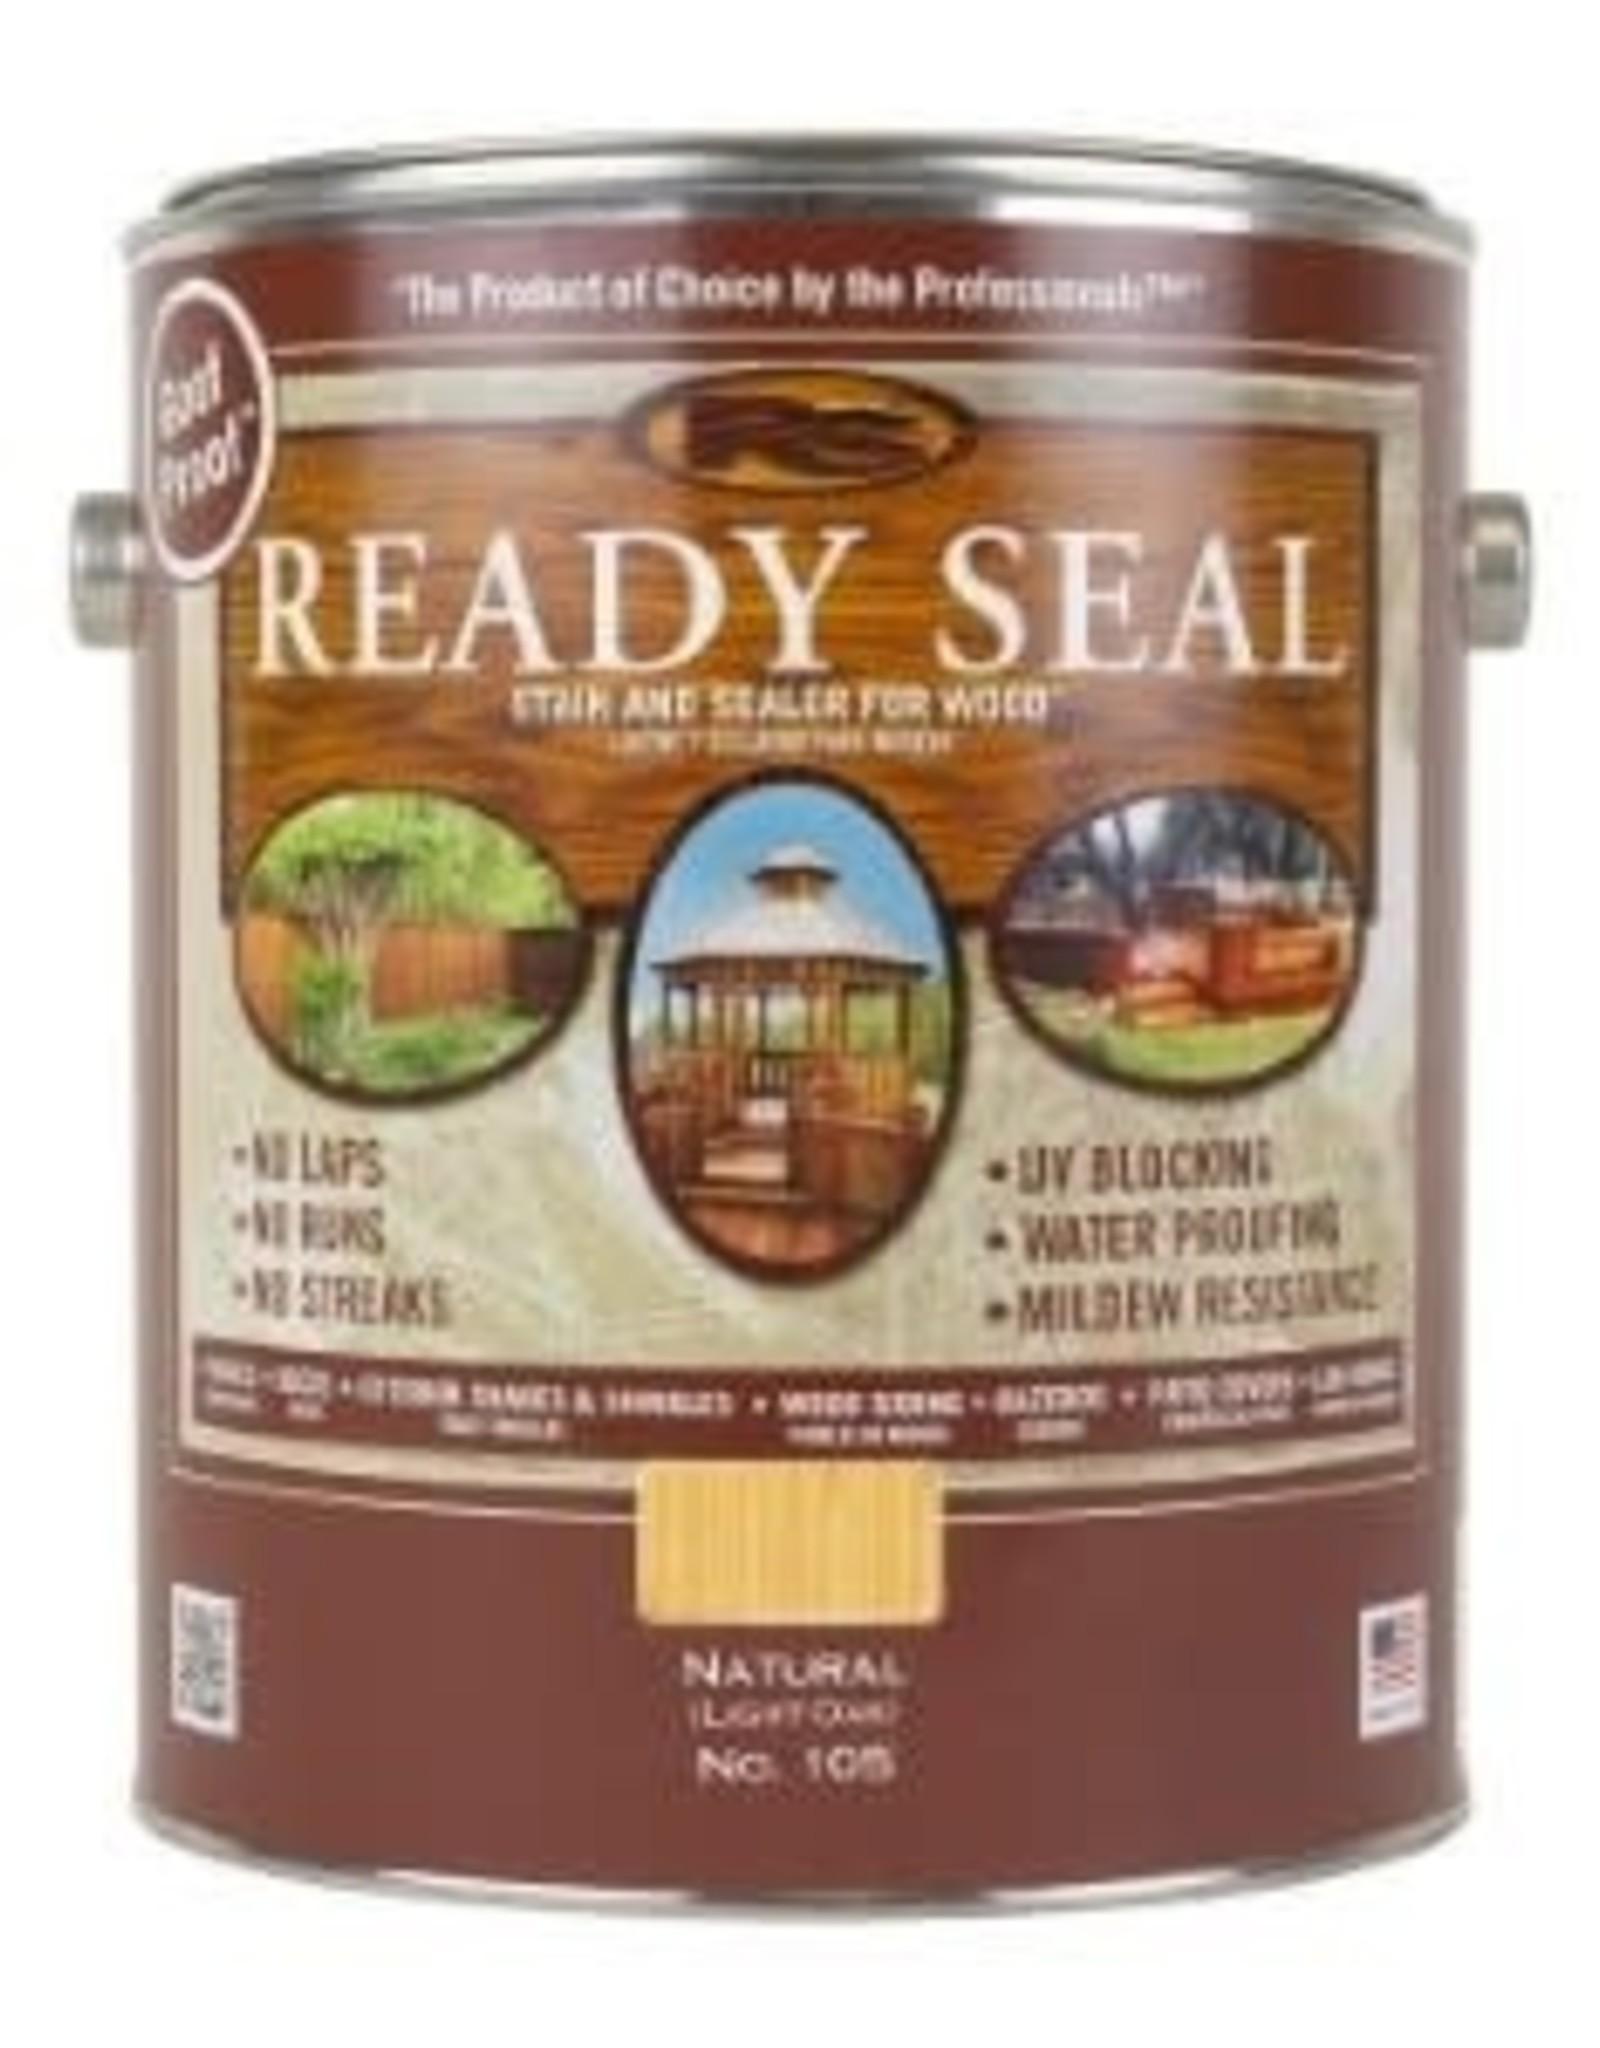 Ready Seal Ready Seal - 1 - Gallon -  Natural (Light Oak)